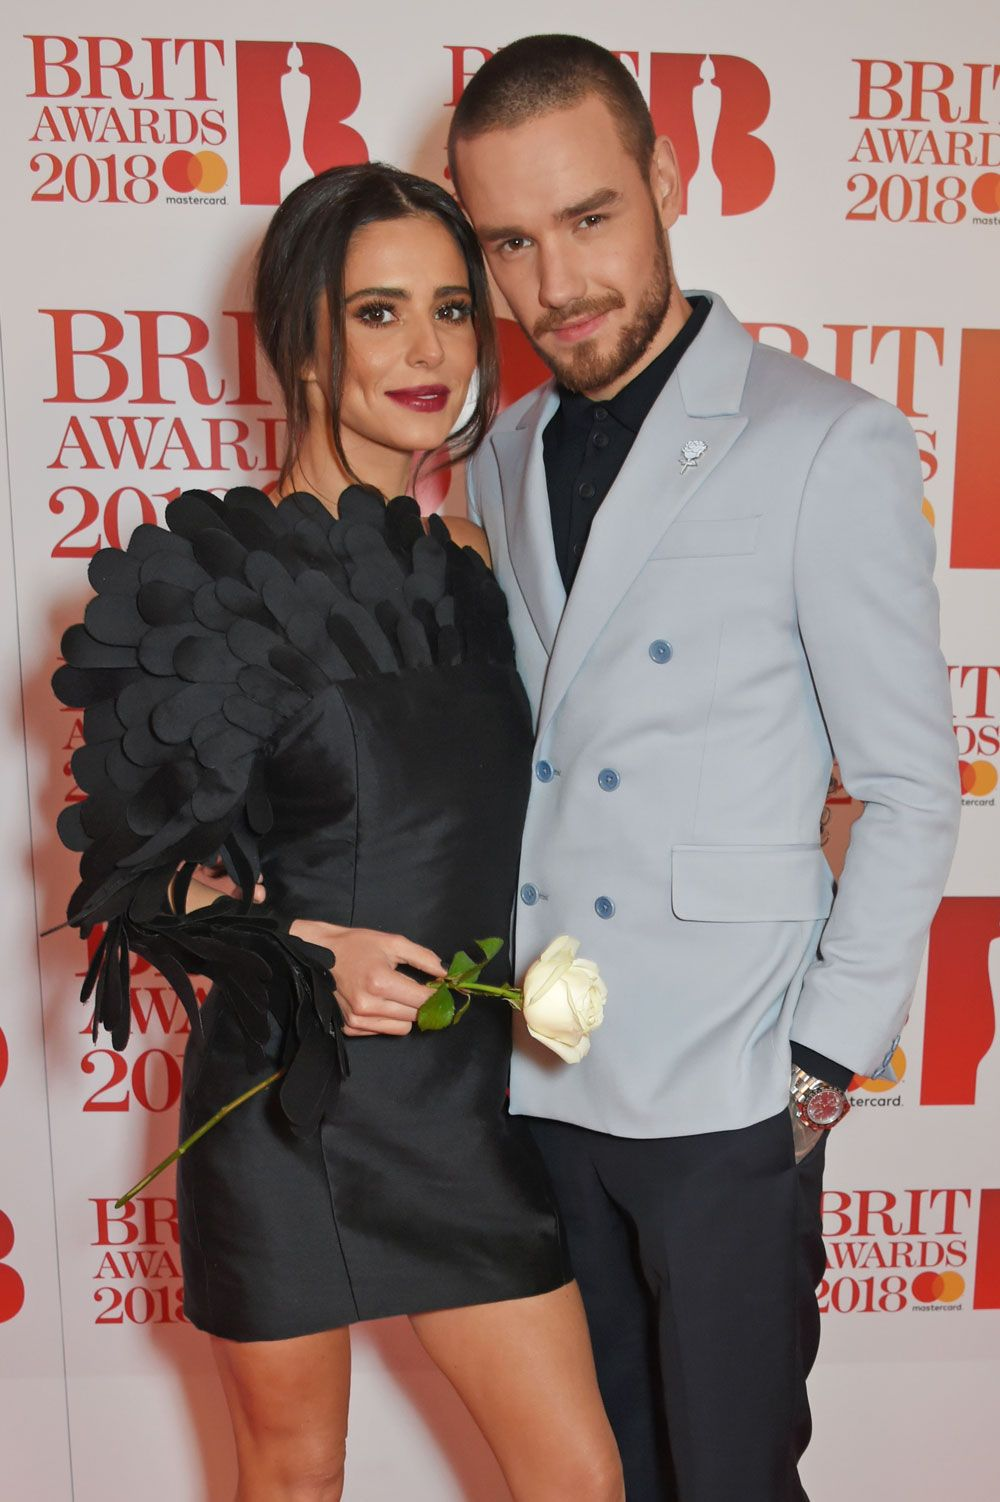 Cheryl Cole Liam Payne Brit Awards